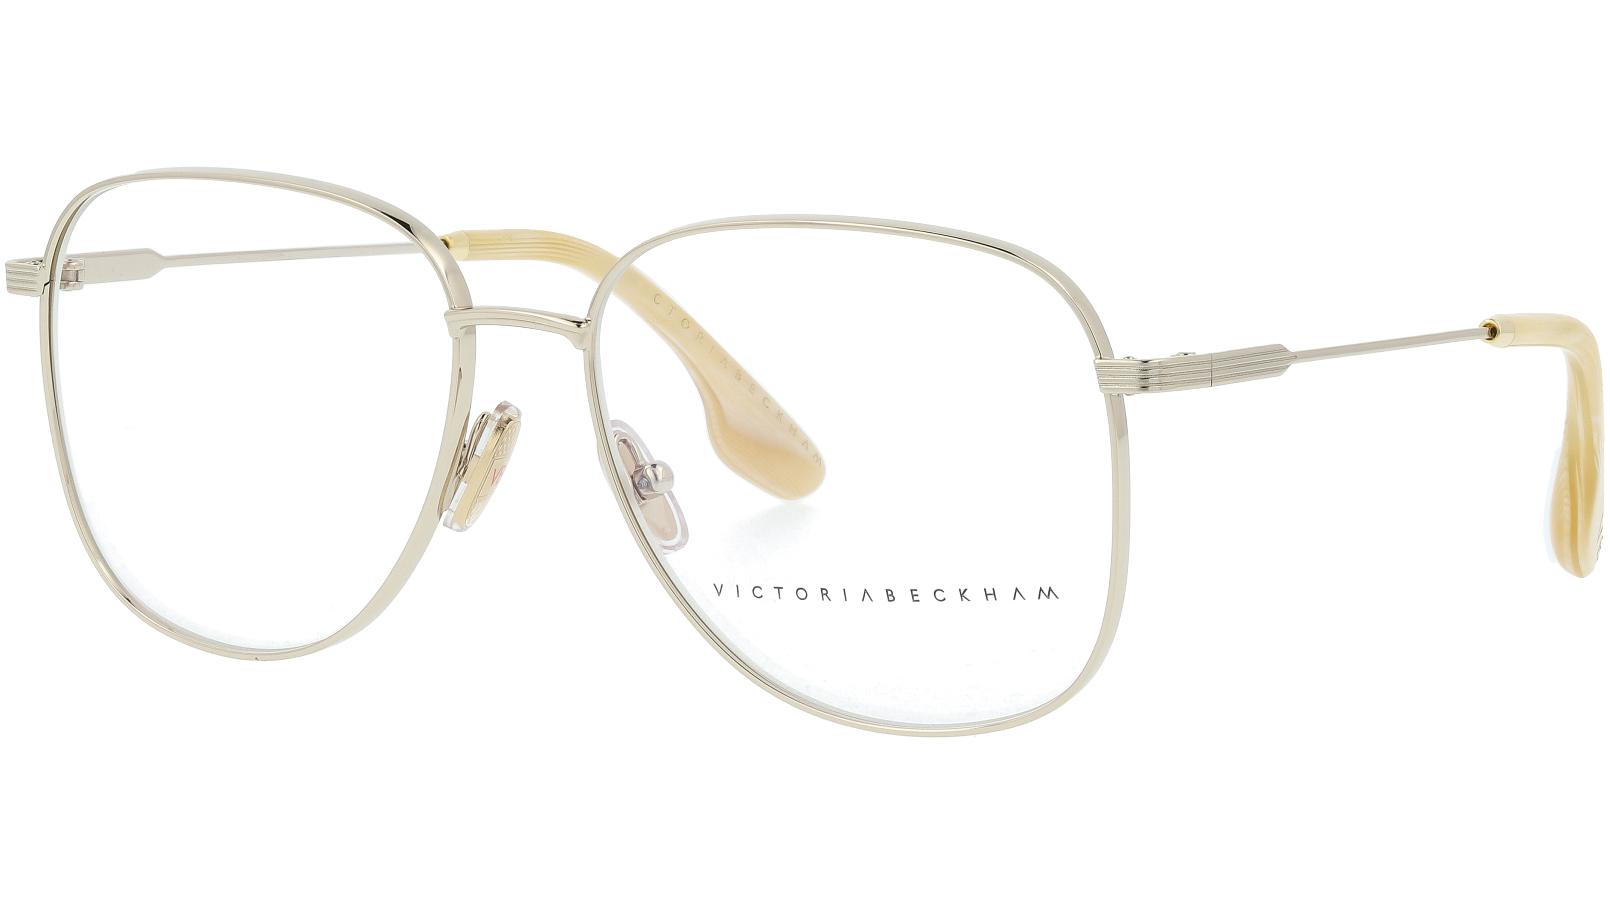 VICTORIA BECKHAM VB219 715 55 LIGHT Glasses